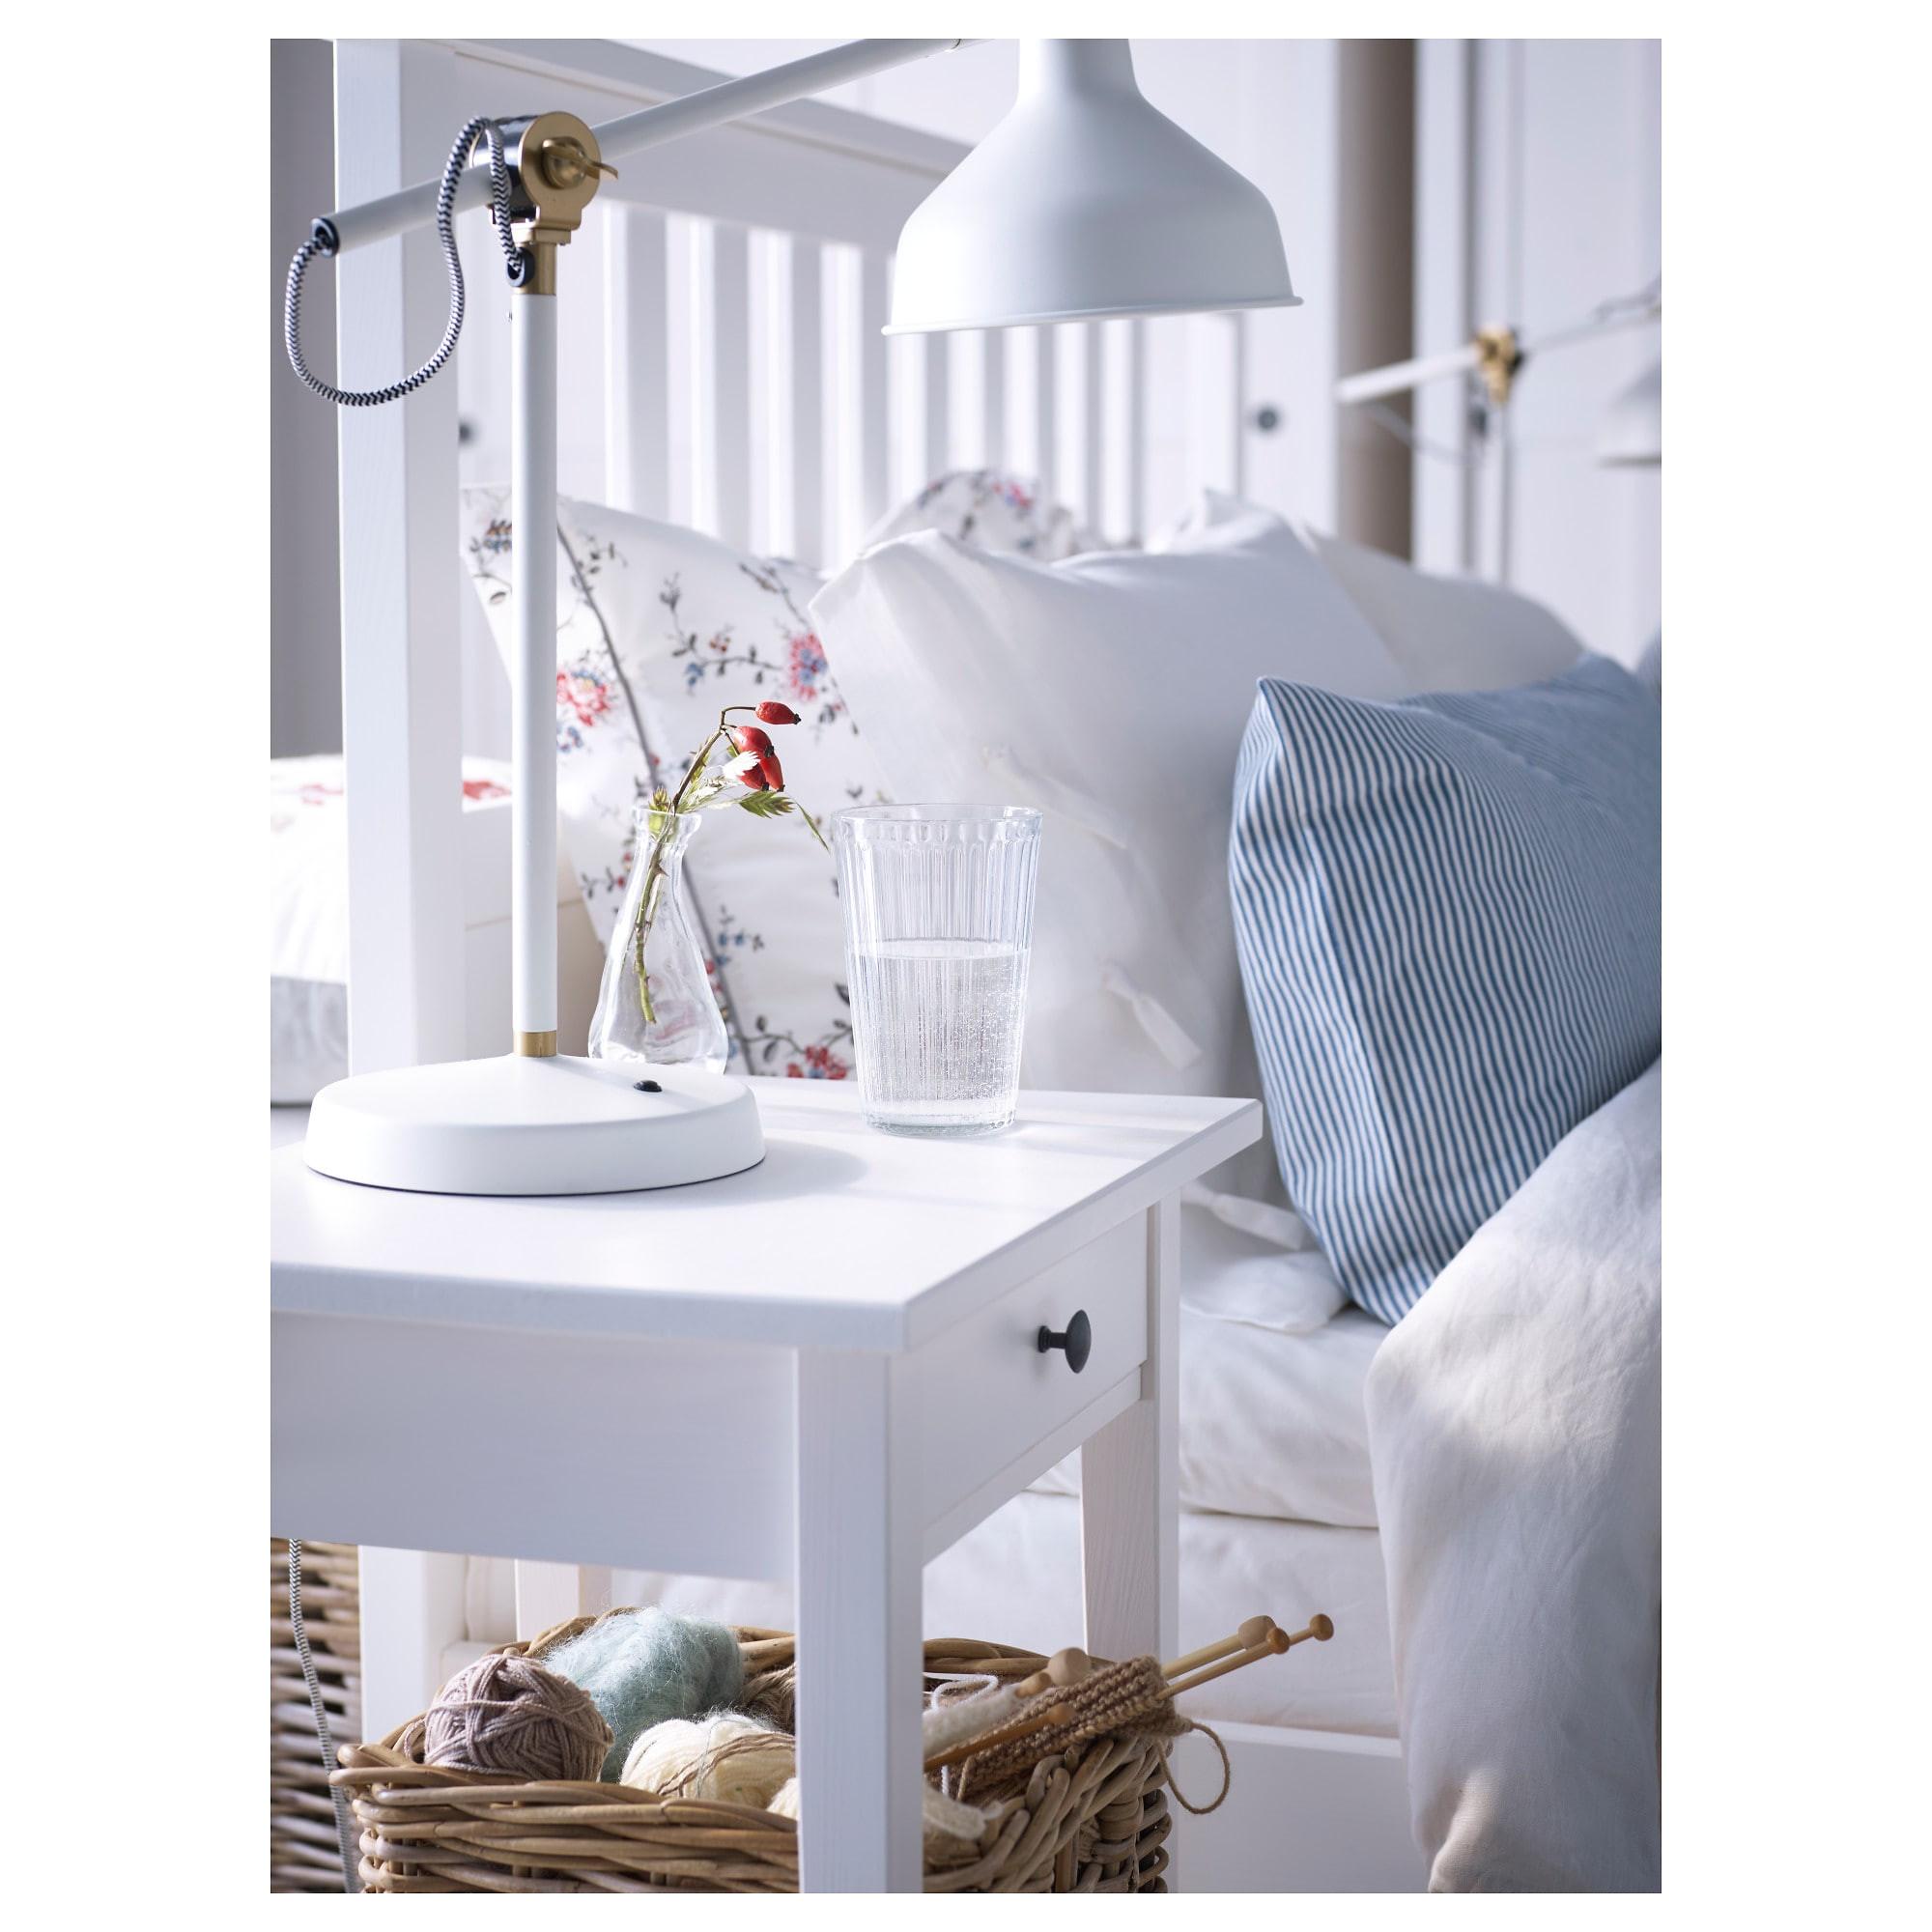 Ikea Slatted Bed Base Vs Box Spring Hemnes Bed Frame Queen Black Brown Ikea